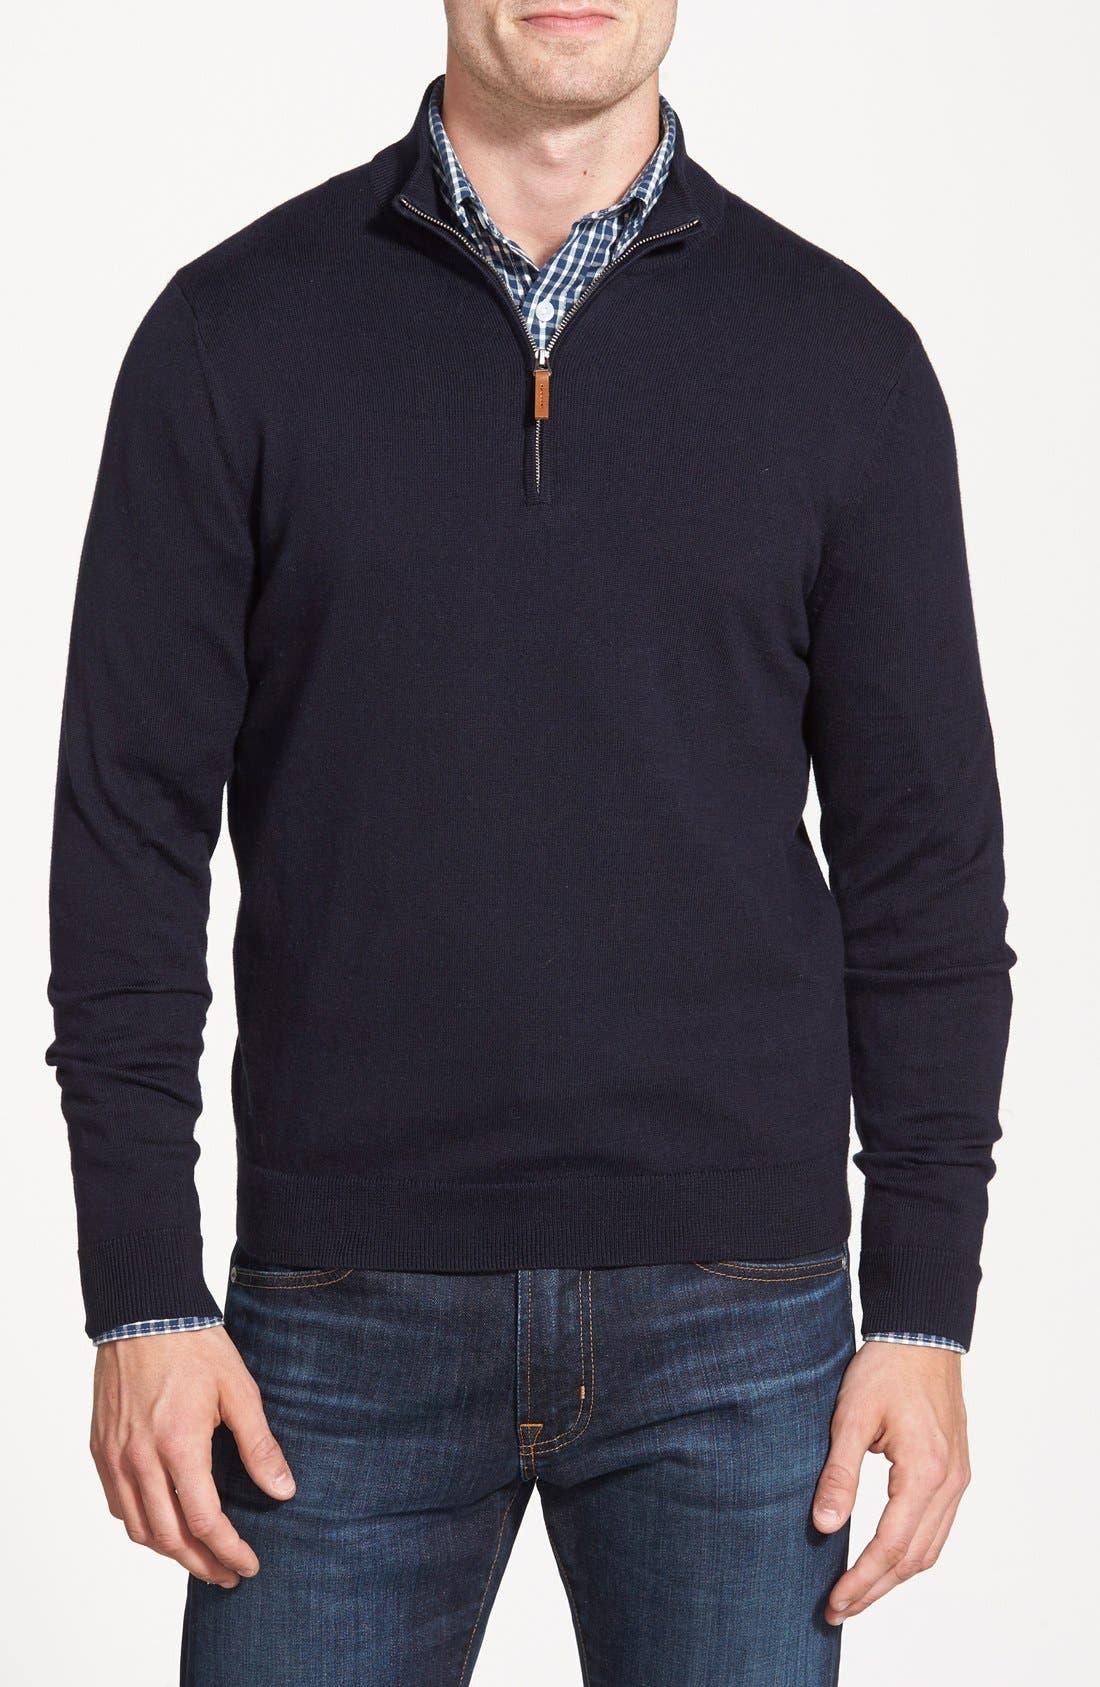 Alternate Image 1 Selected - Nordstrom Men's Shop Half Zip Cotton & Cashmere Pullover (Regular & Tall)